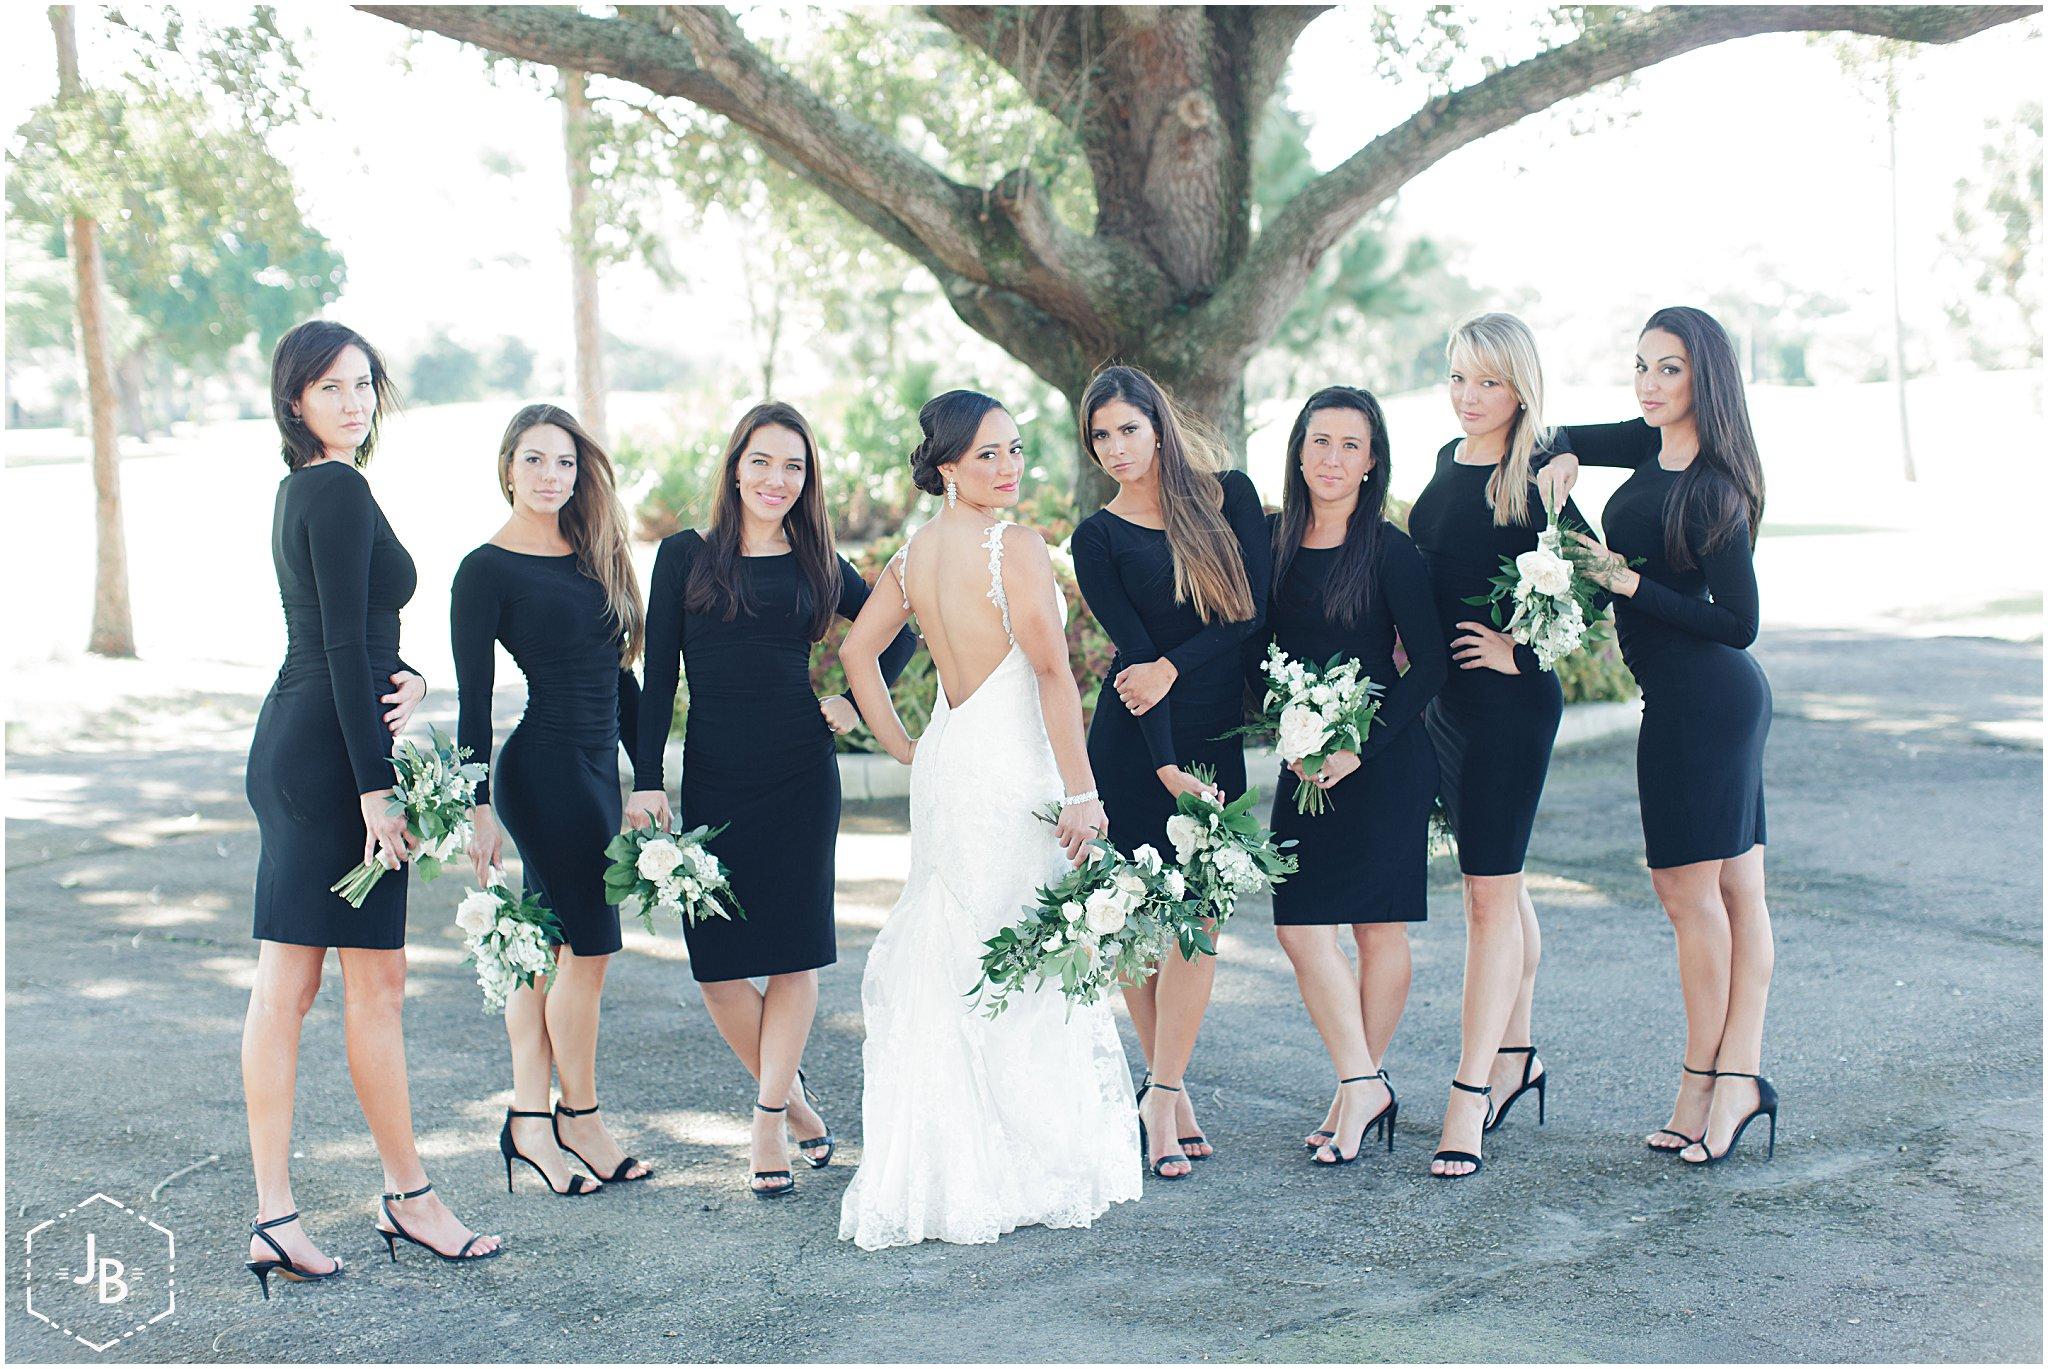 WeddingandEngagementFloridaPhotographer_0231.jpg